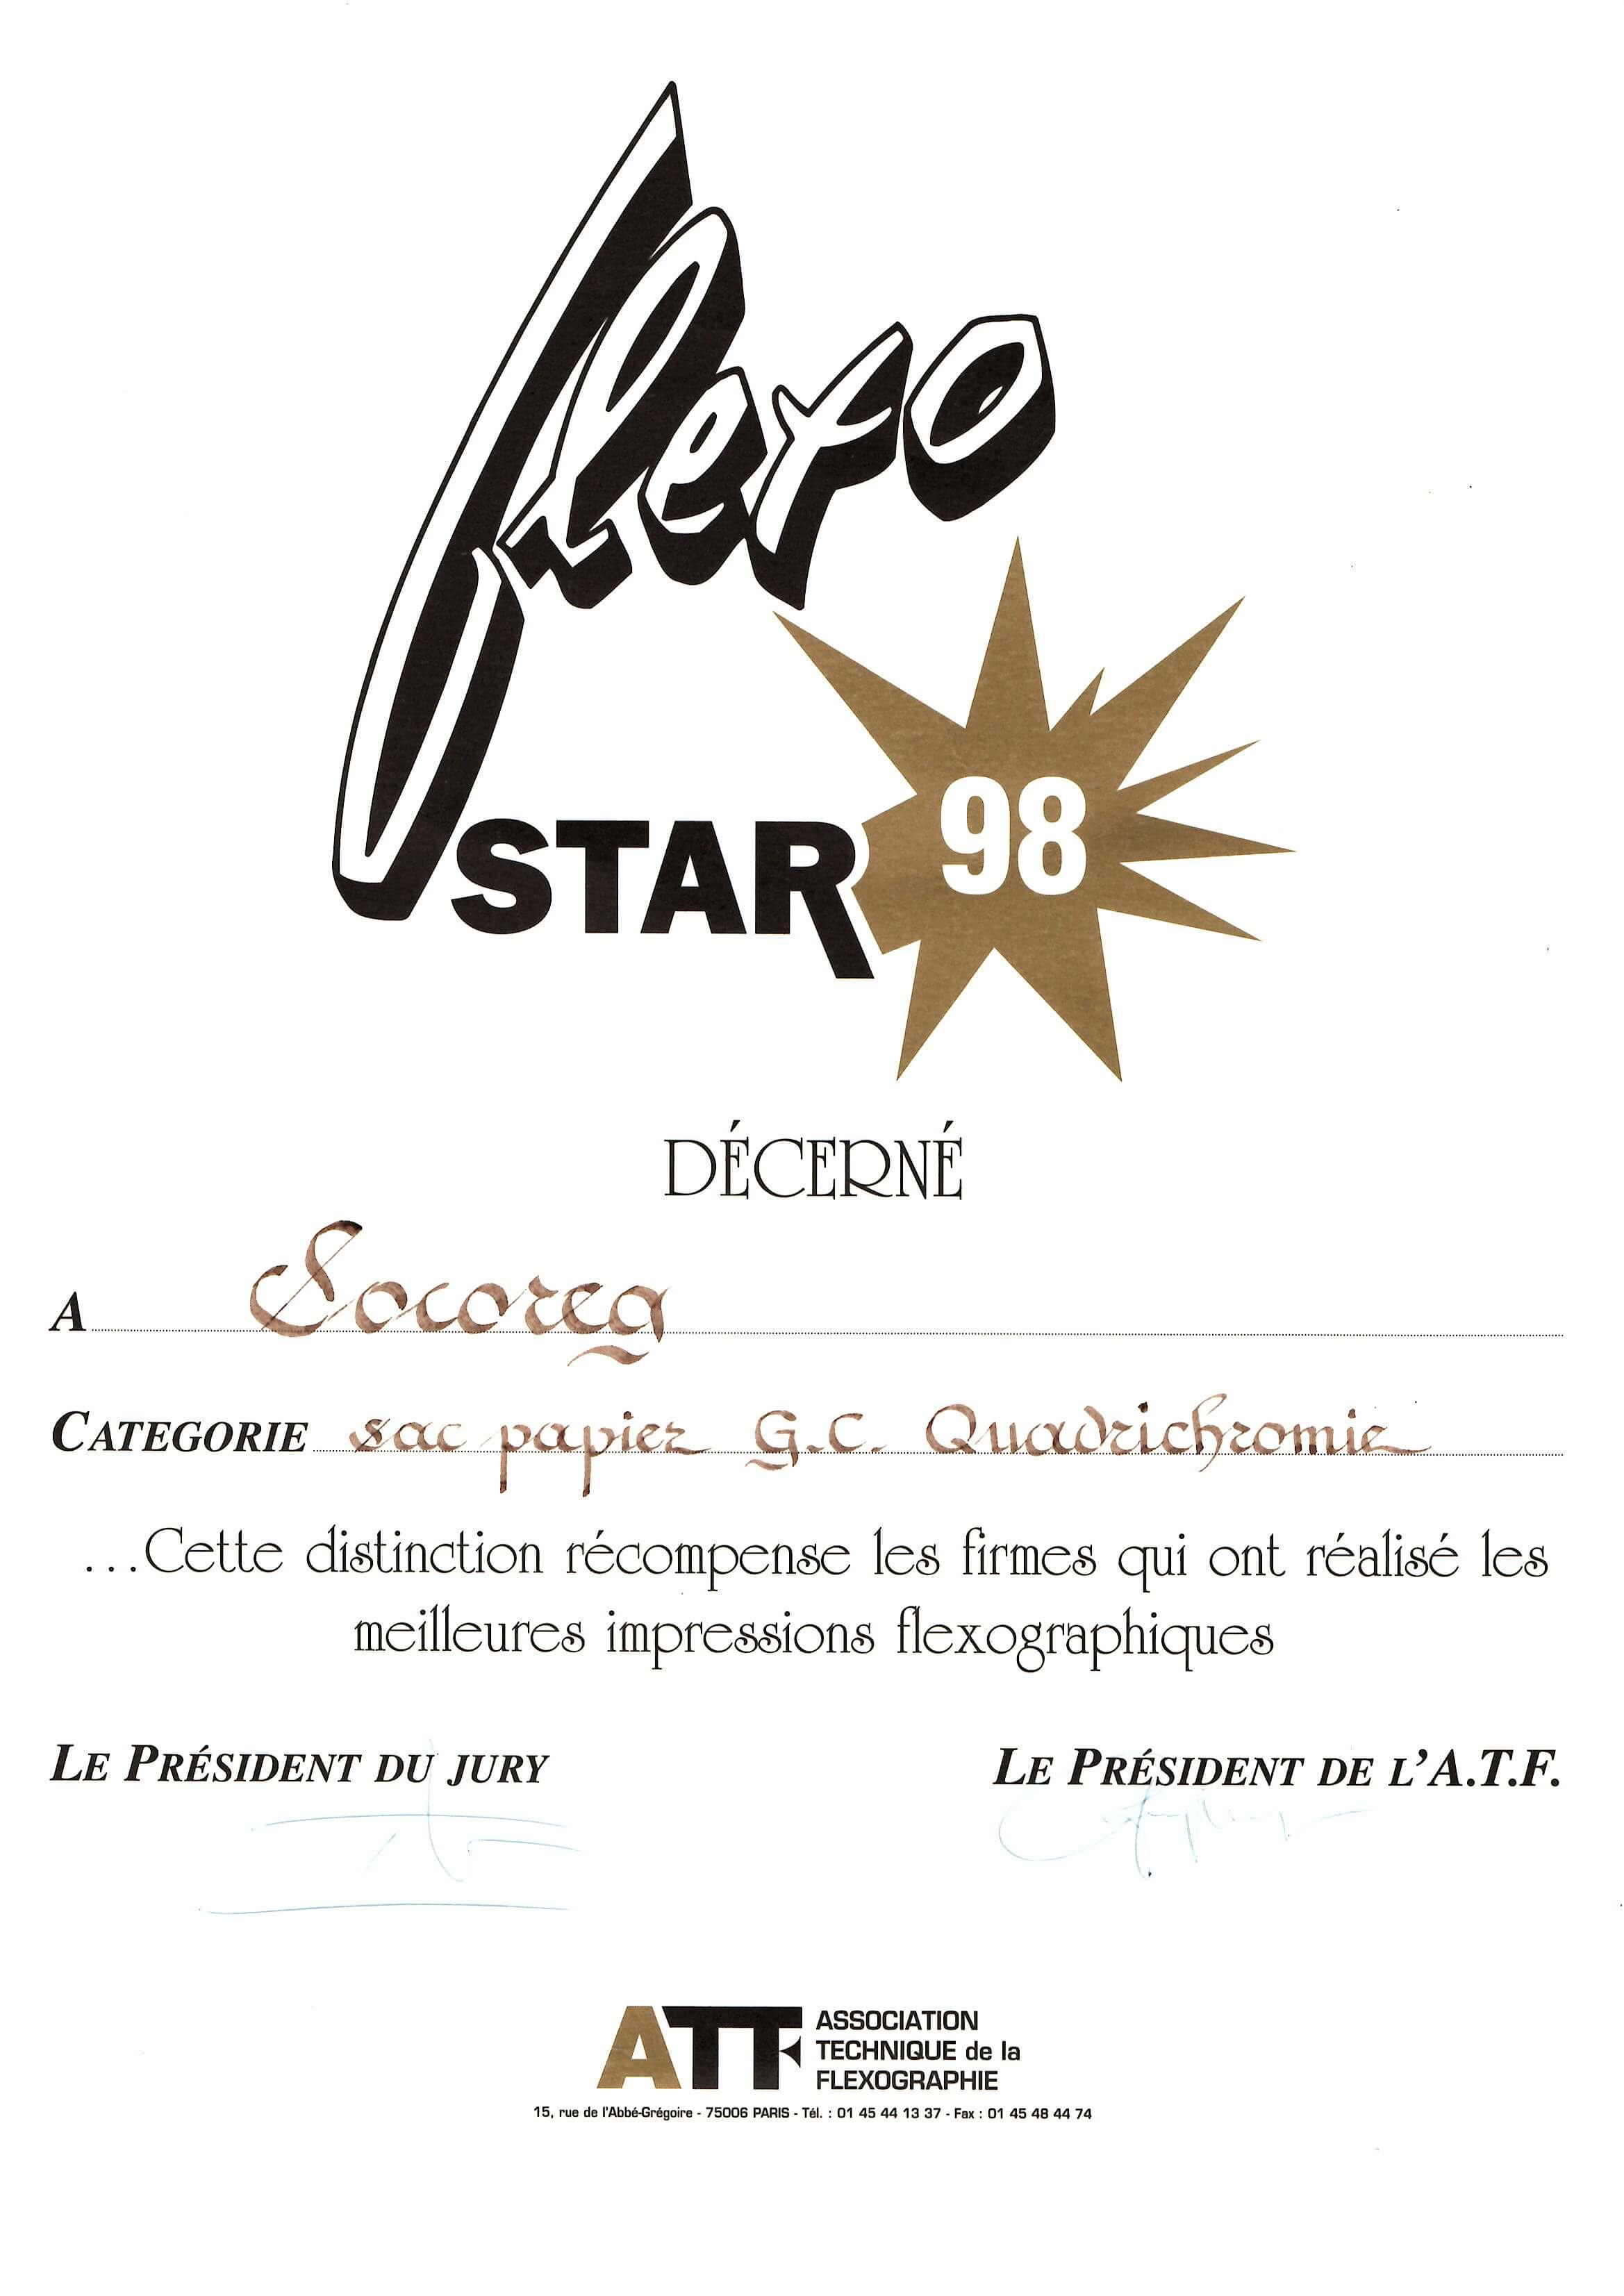 flexostar 98